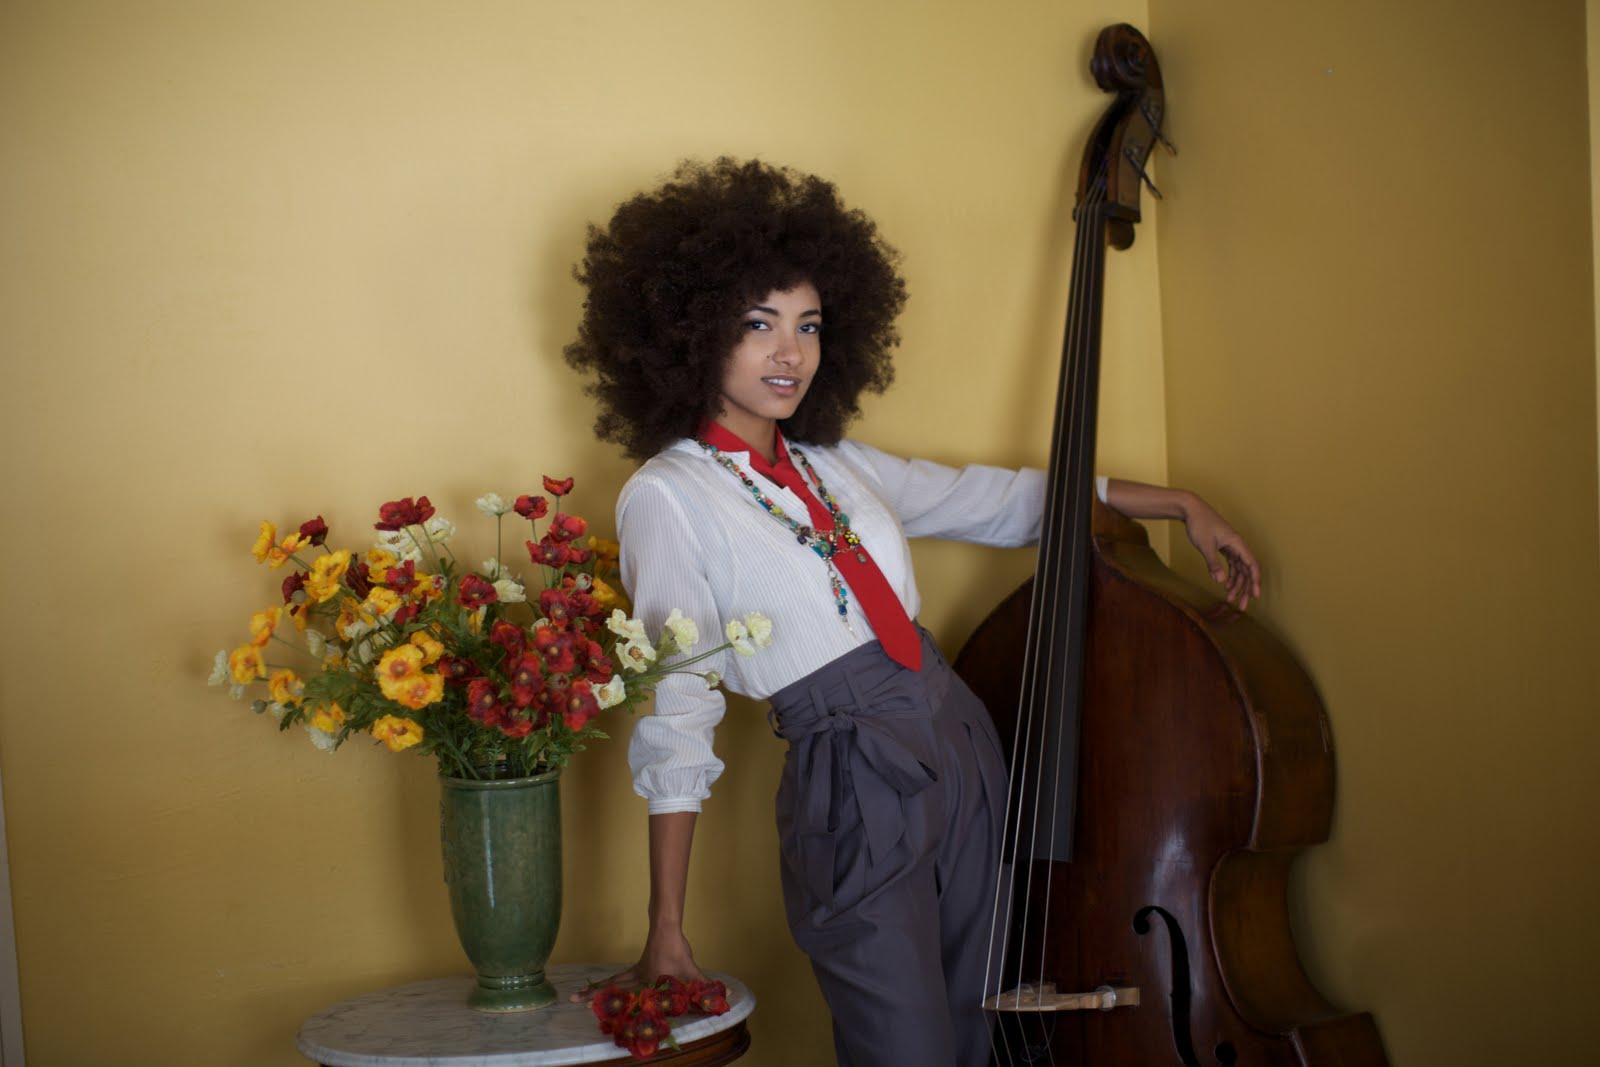 http://3.bp.blogspot.com/_CHQ_Kq9bMIc/TDz6Wu42DeI/AAAAAAAAH8A/8eRZSFRZ4aQ/s1600/esperanza_spalding_natural_hair1.jpg